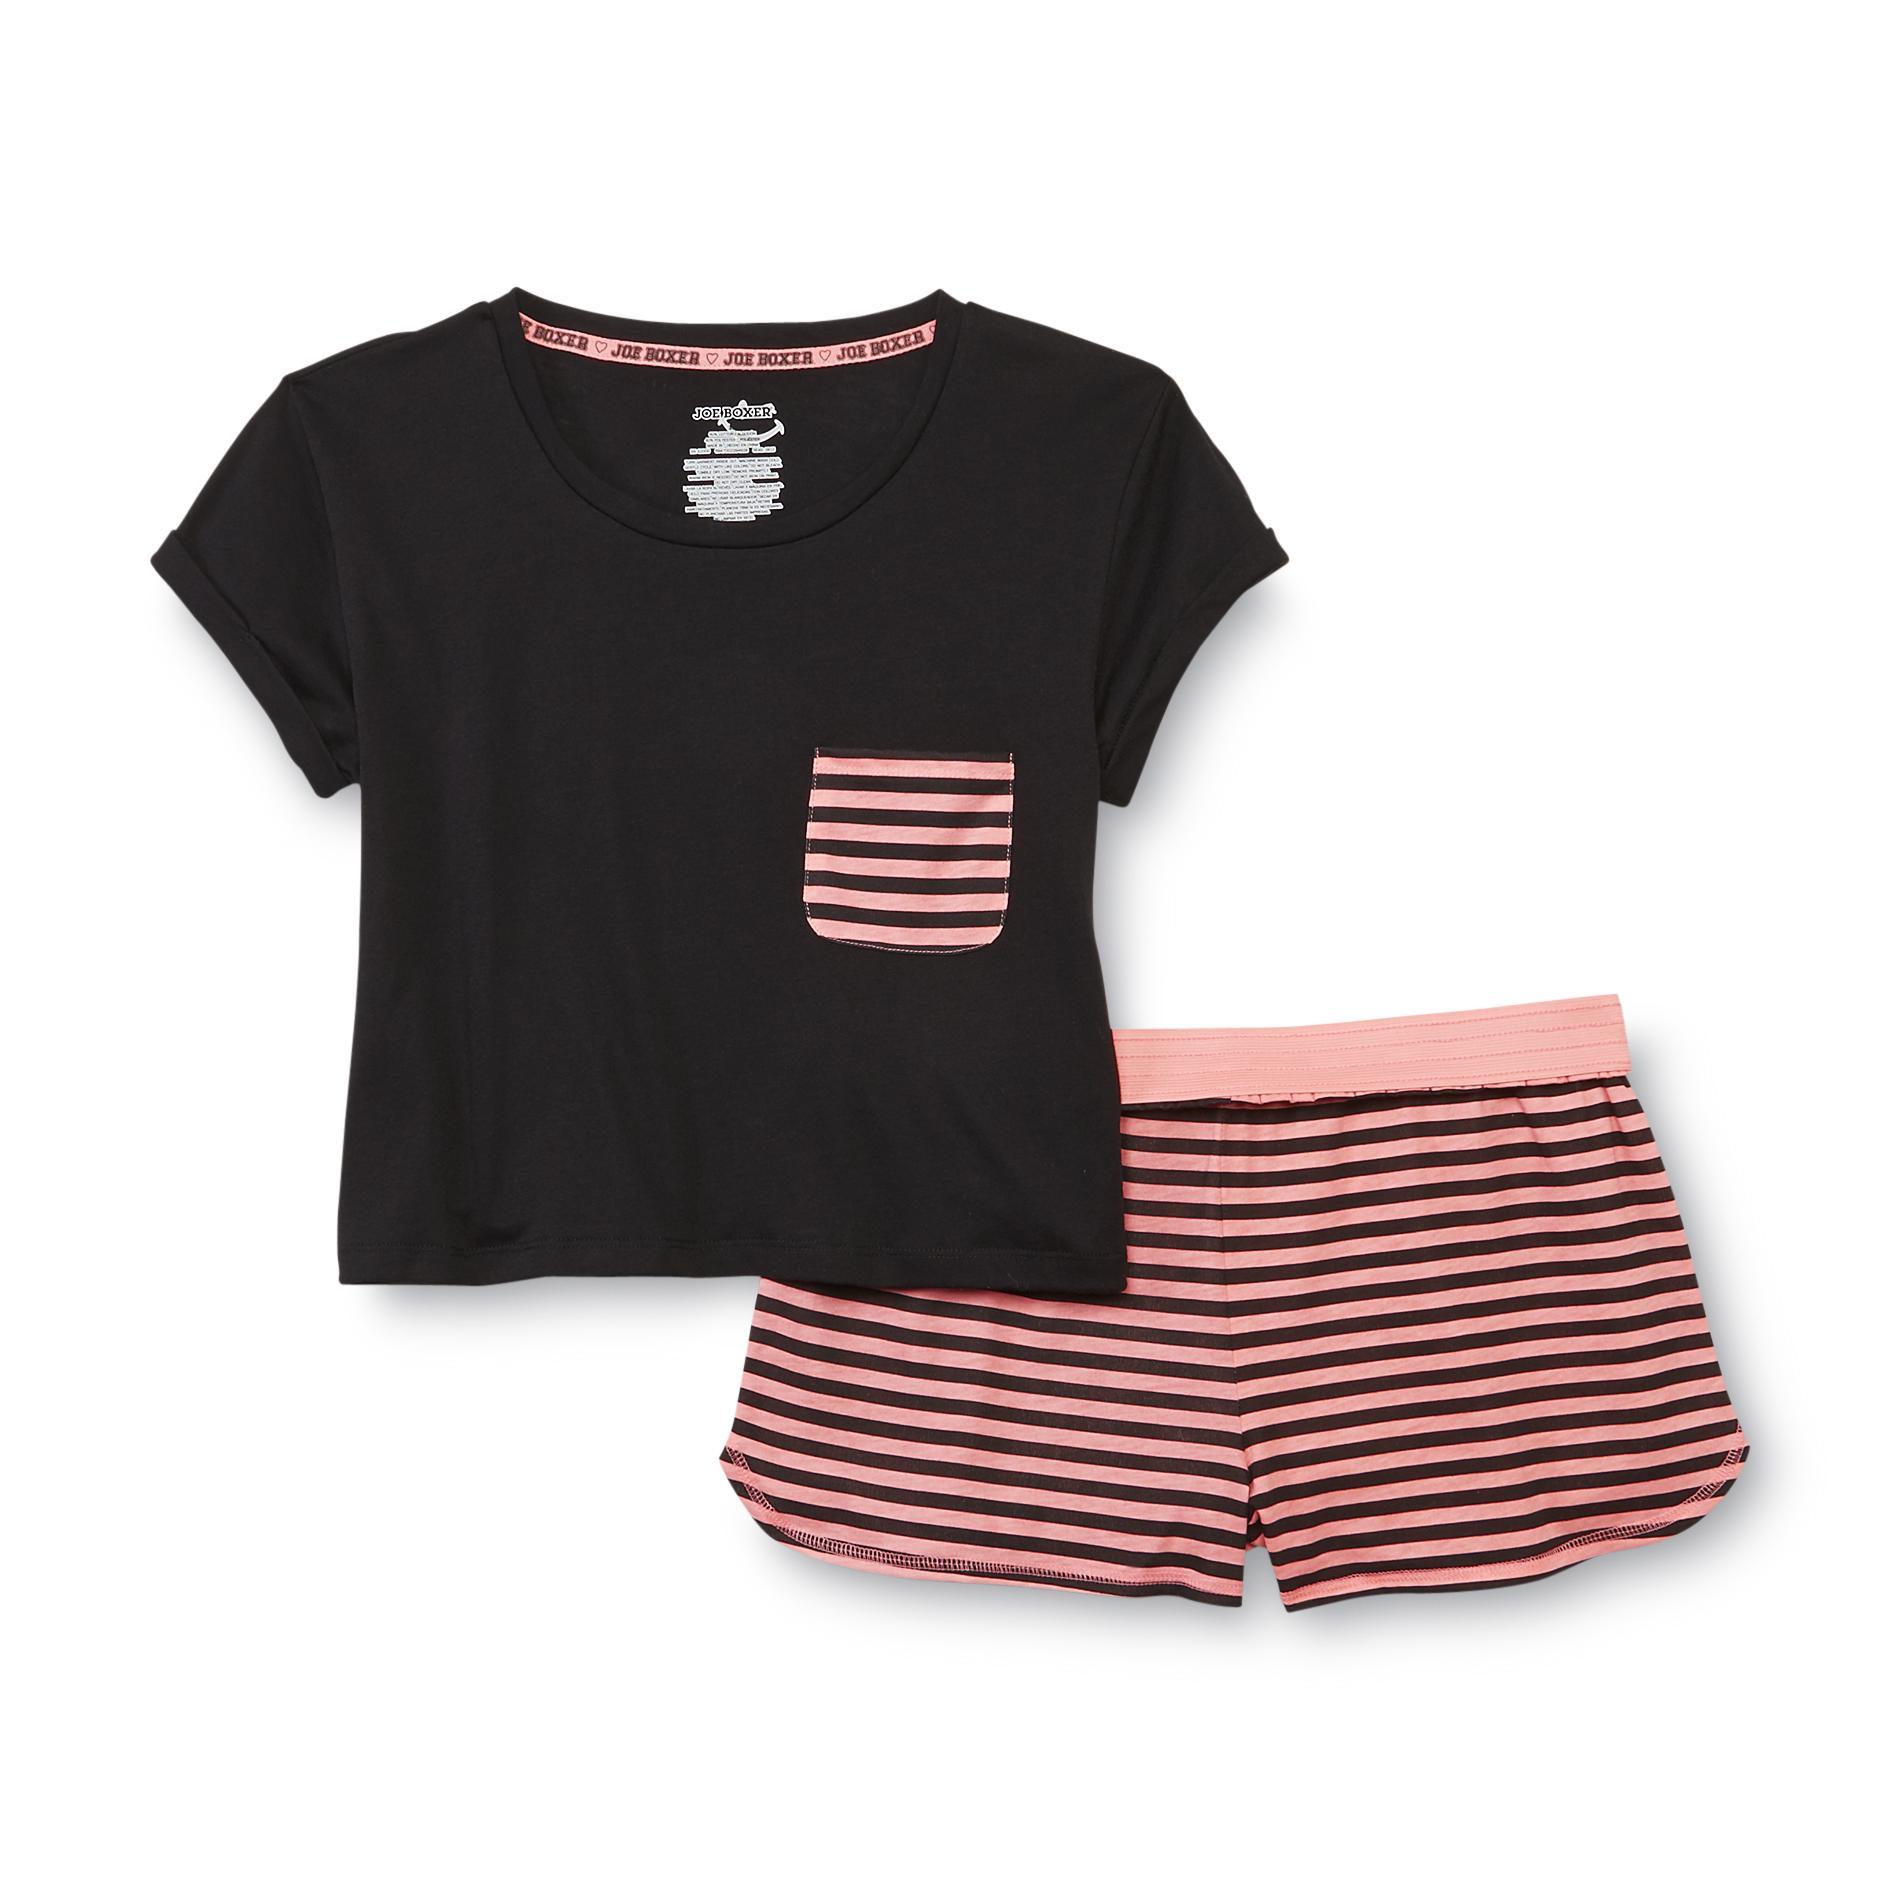 Joe Boxer Women's Short-Sleeve Pajamas - Striped